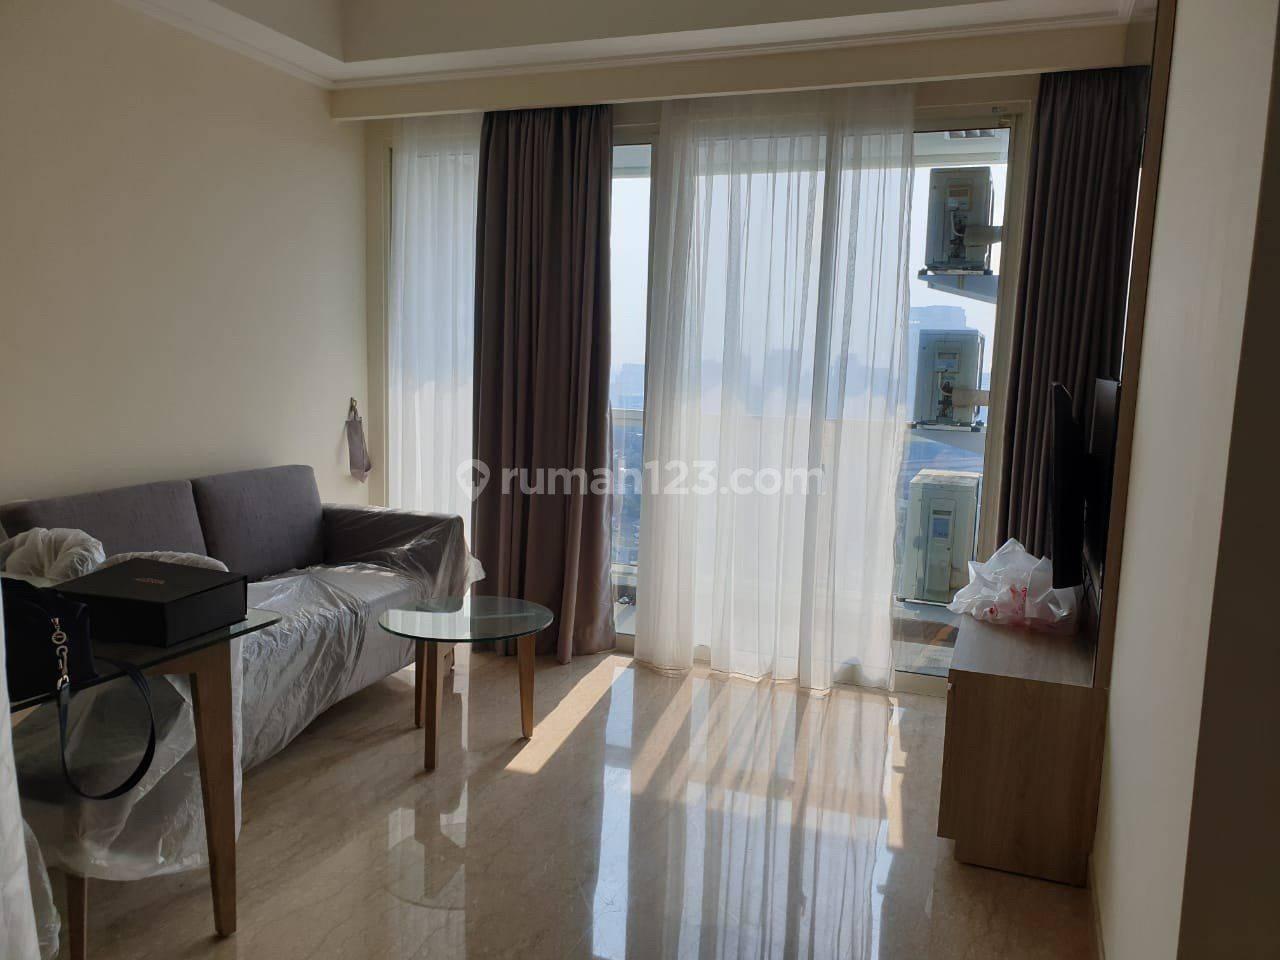 Apartemen Menteng Park - Cikini Jakarta Pusat - 3 BR [Fully Furnished]